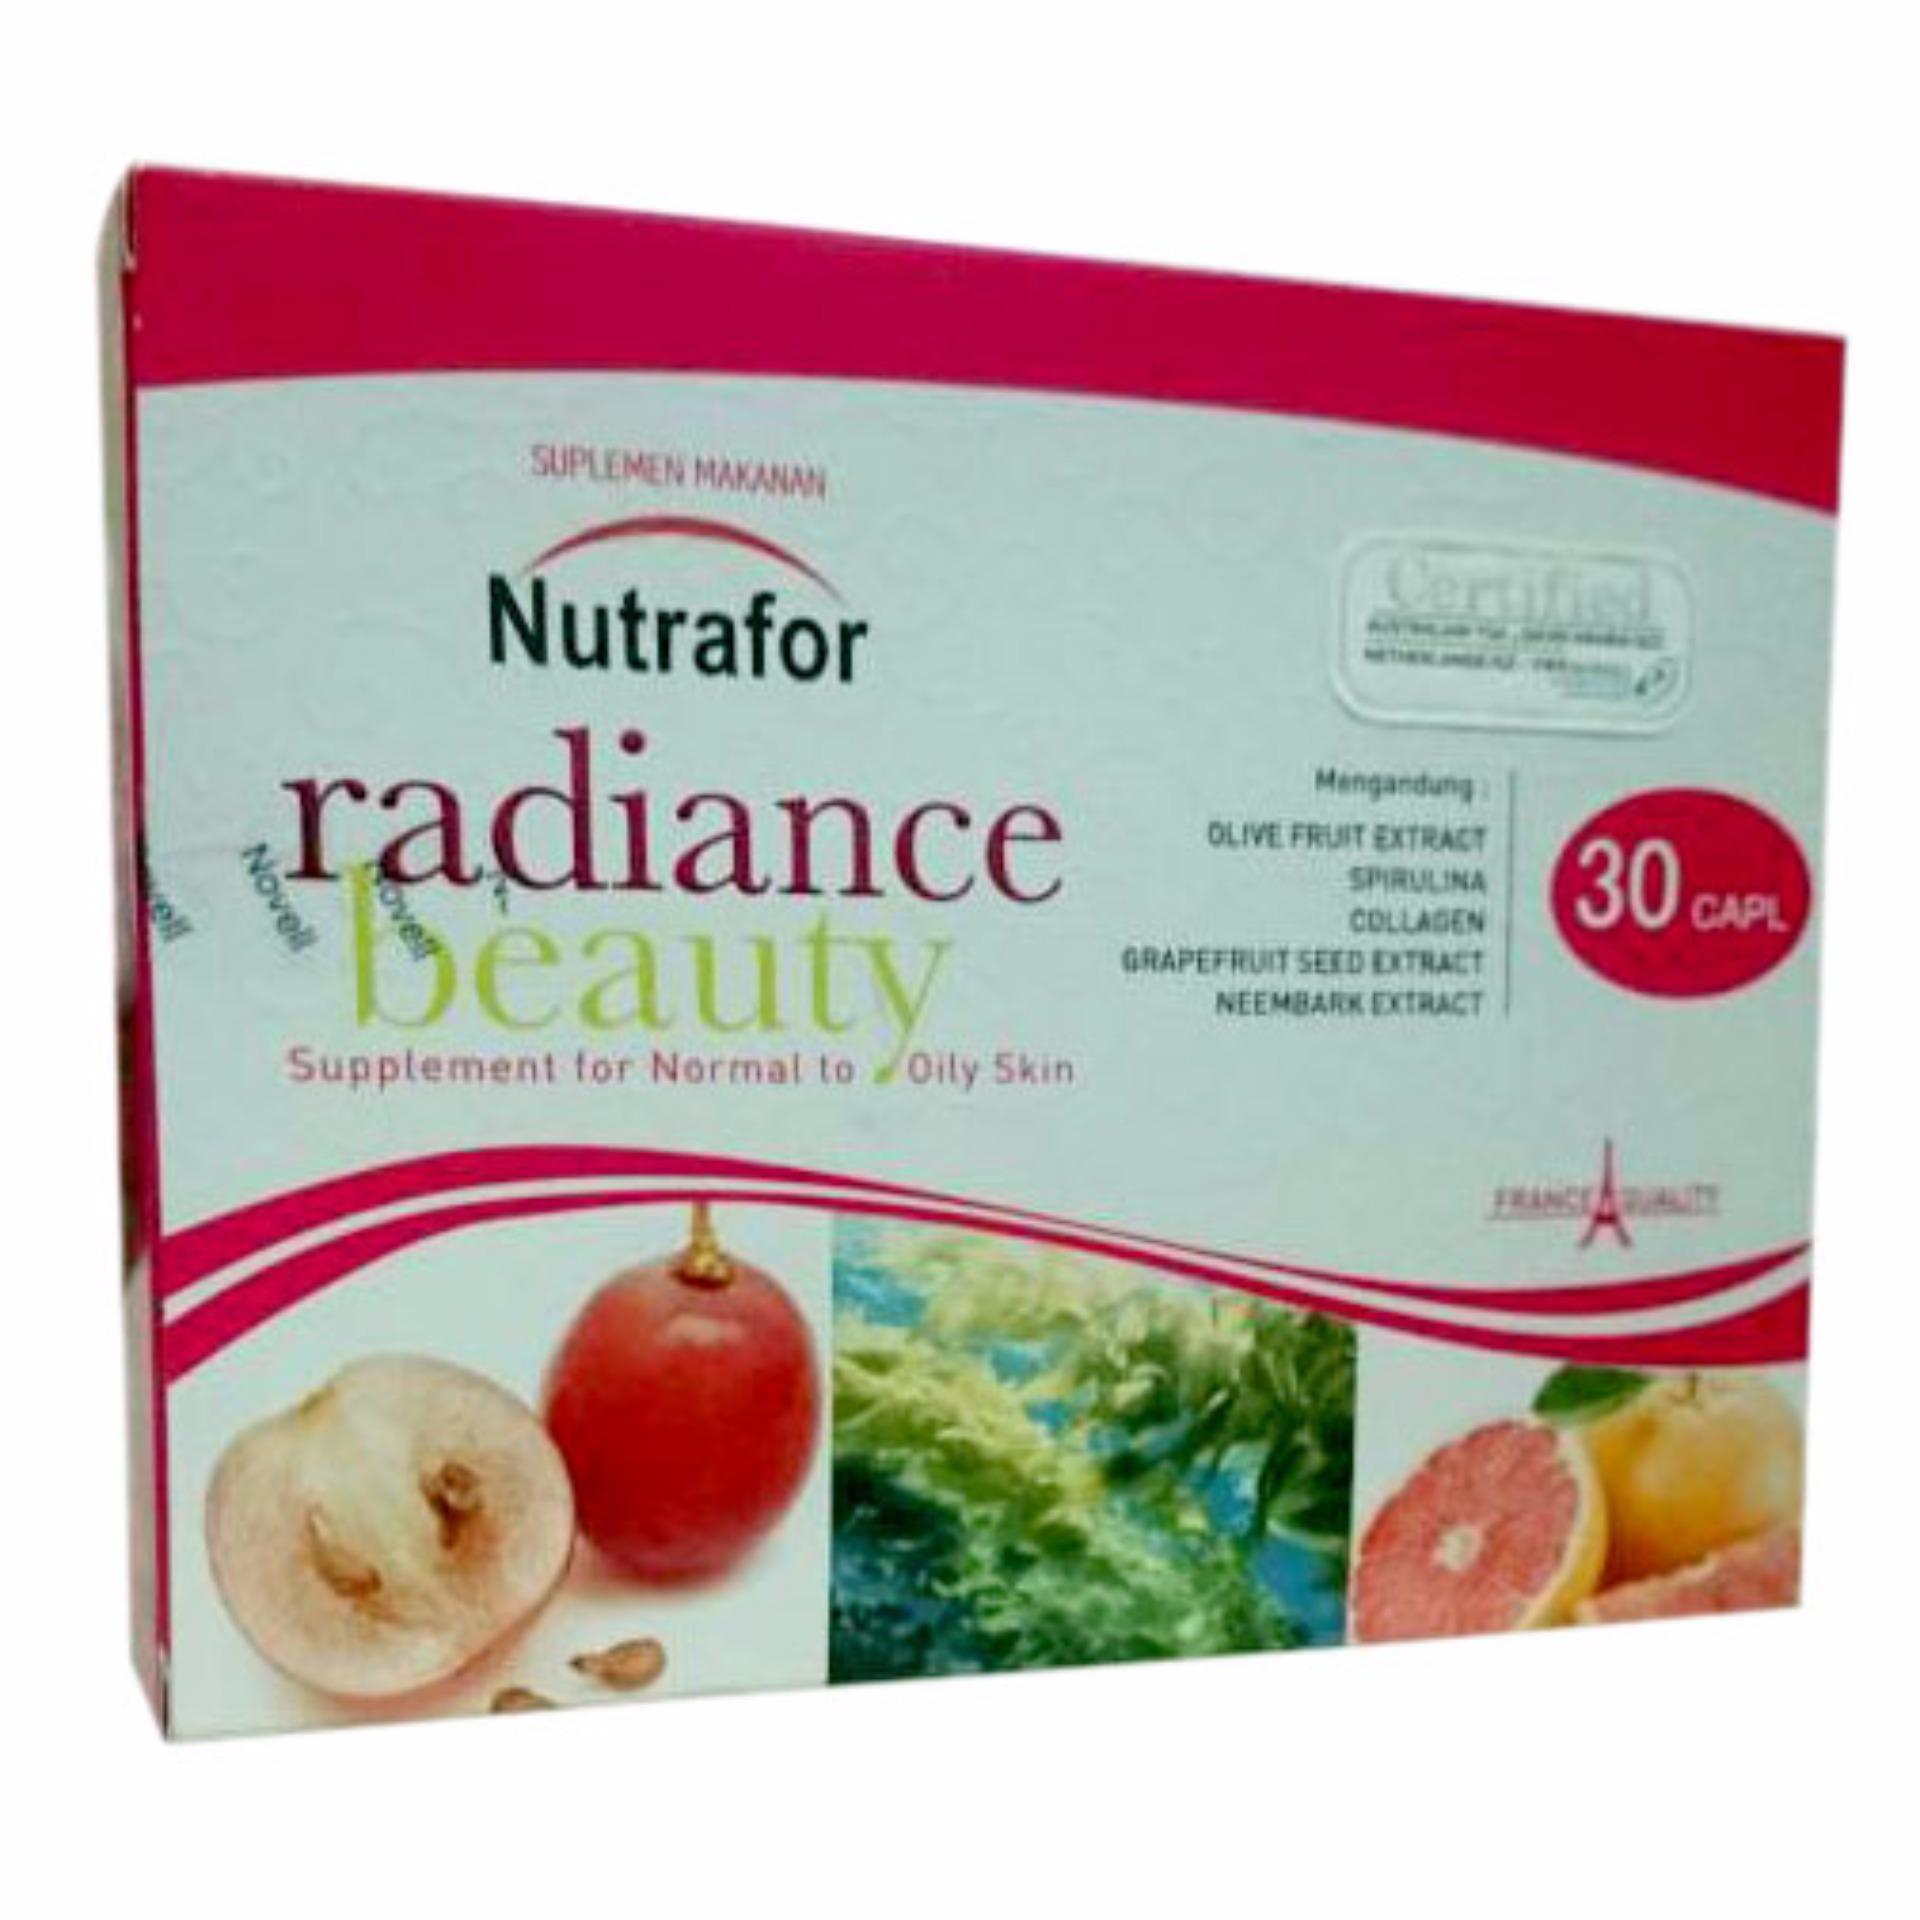 Toko Delin Store Nutrafor Radiance Beauty 1 Box Vitamin Untuk Kulit Berminyak Kulit Berjerawat Bisa Cod Novell Pharmaceuticals